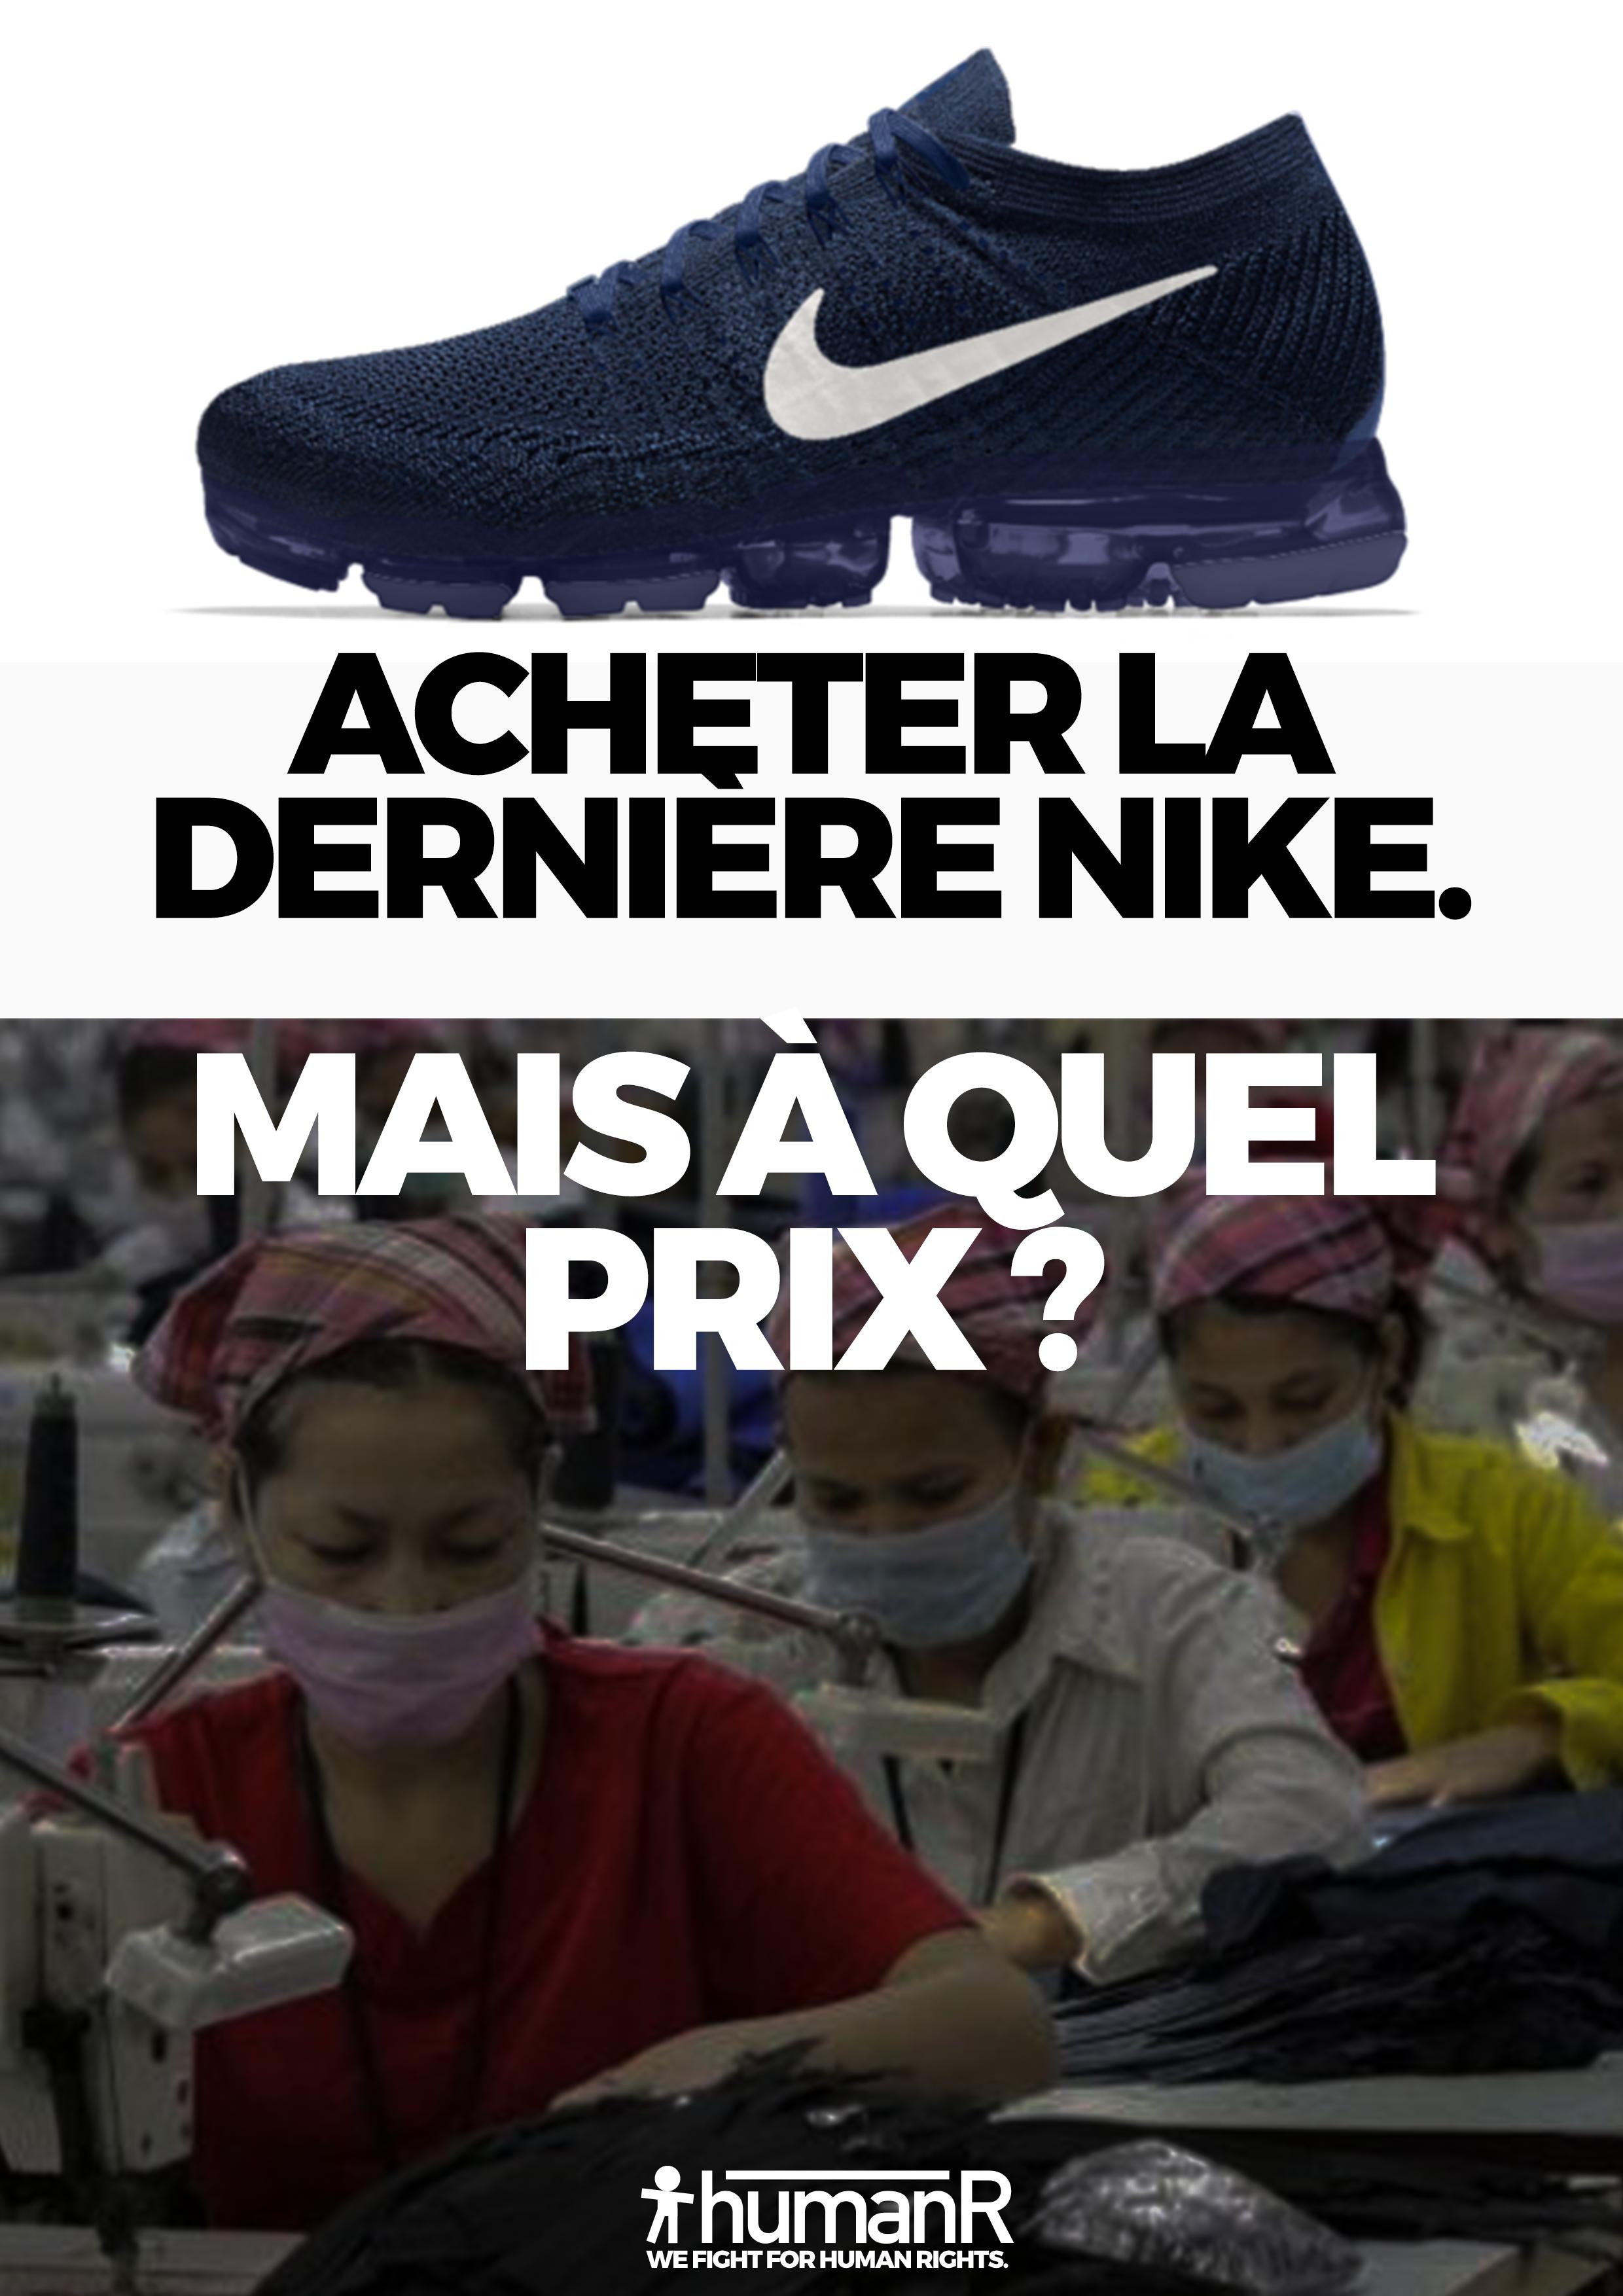 Poster denouncing Nike